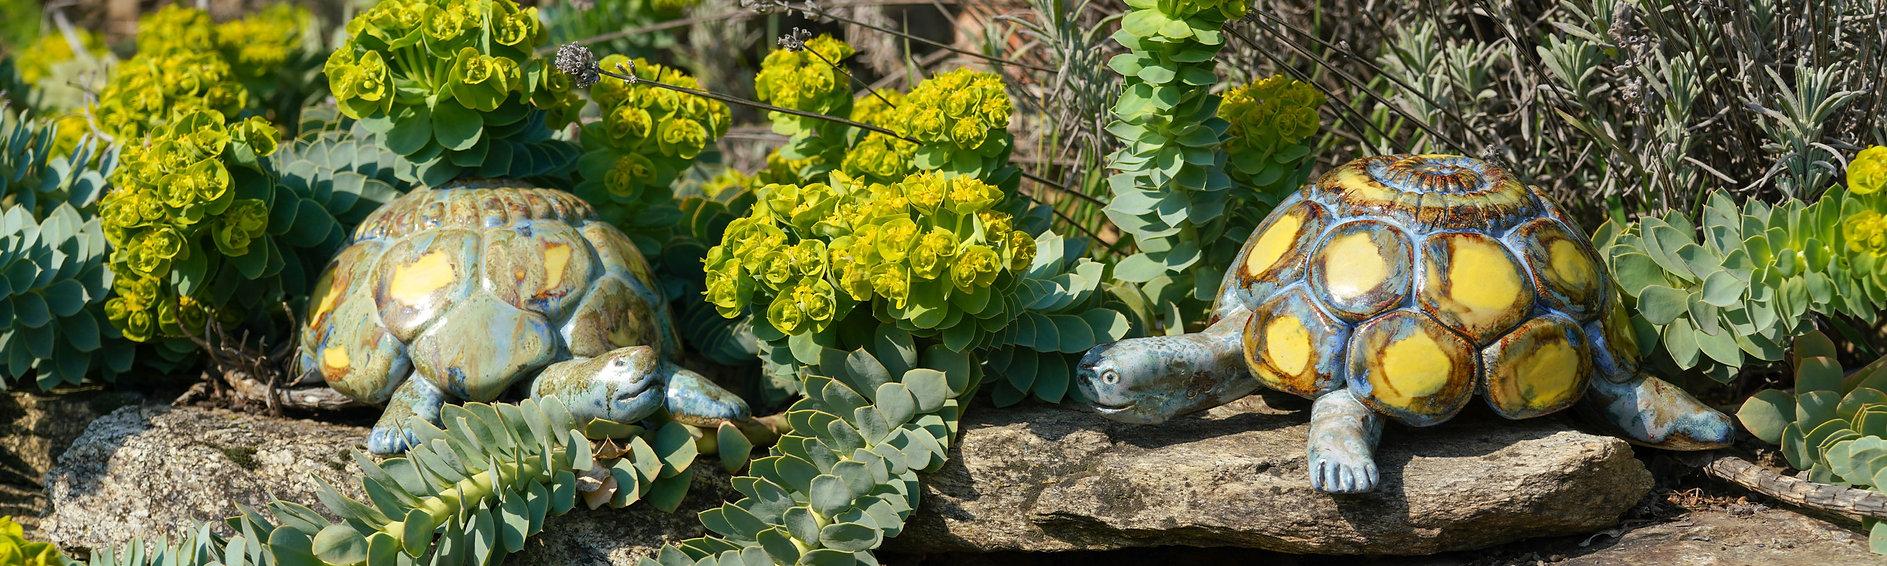 Schildkröte-4.jpg